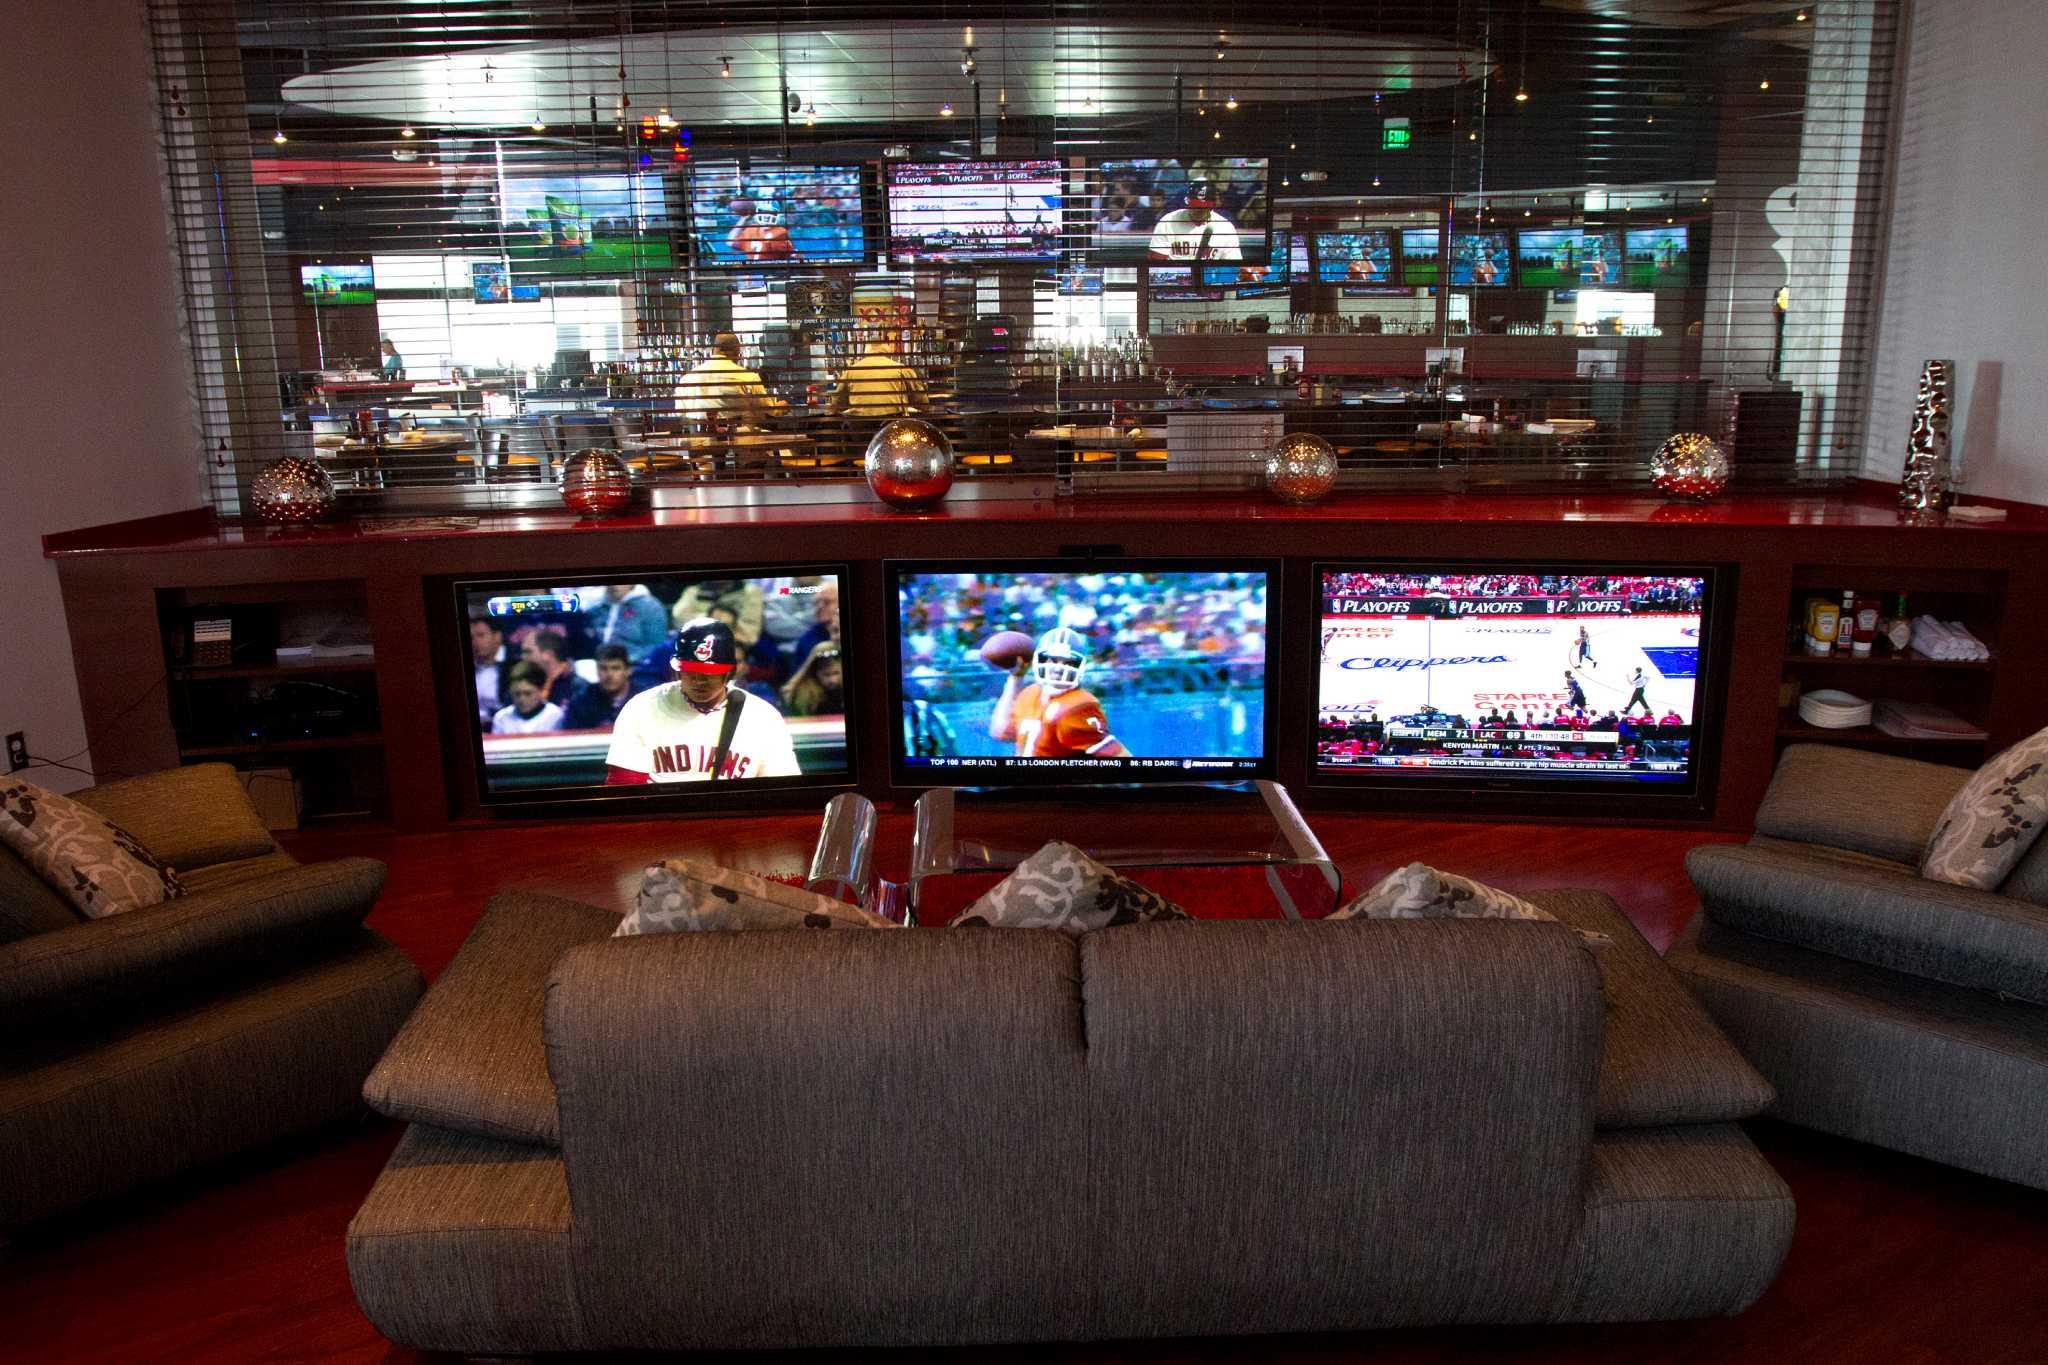 Hcc Game Room